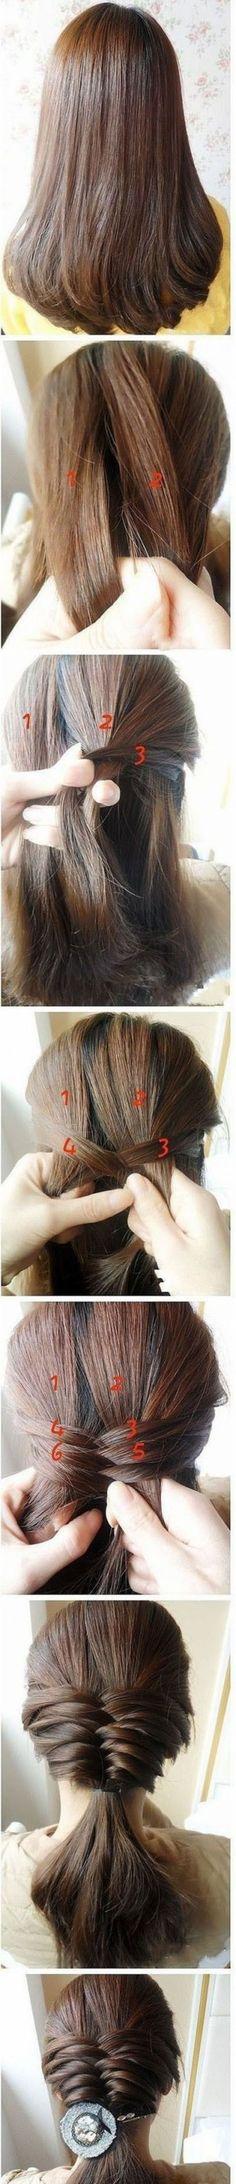 DIY a beautiful hair style